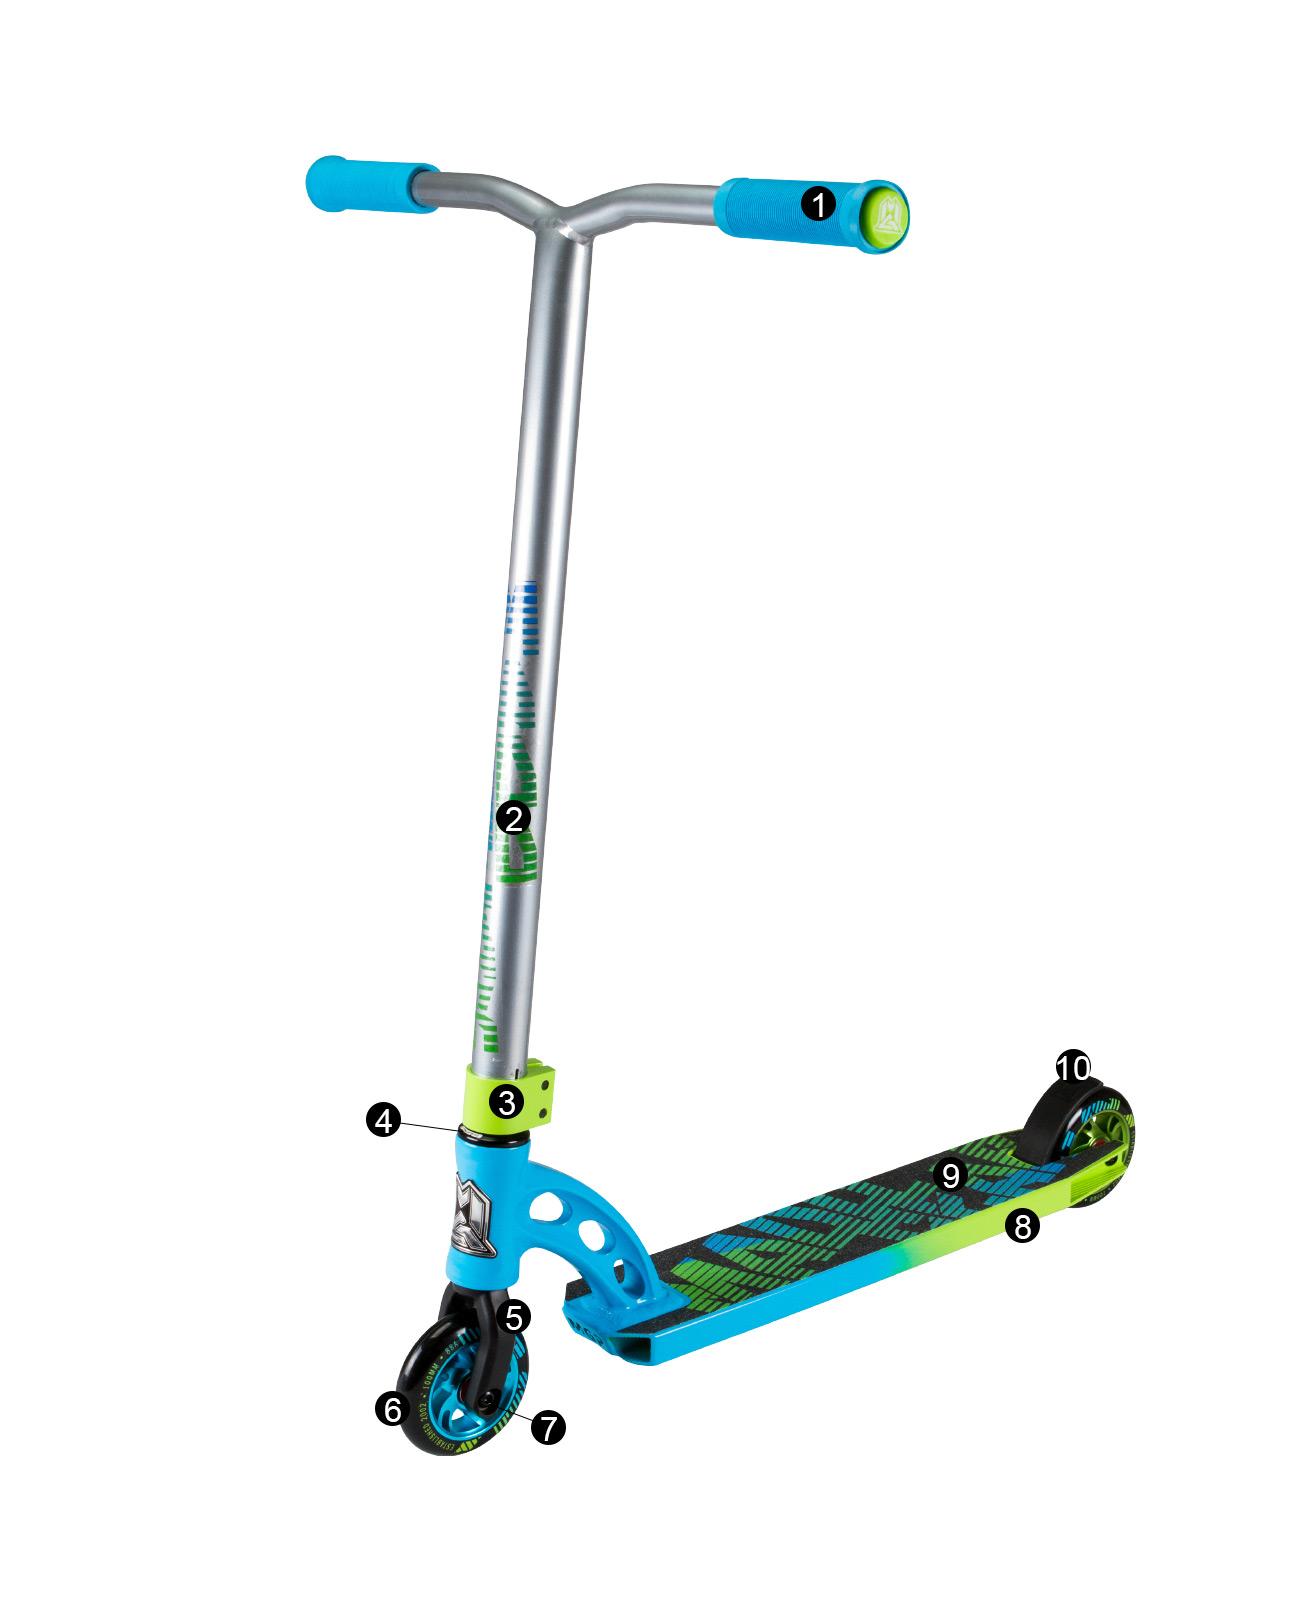 mgp madd gear stunt scooter vx7 pro roller kickboard. Black Bedroom Furniture Sets. Home Design Ideas